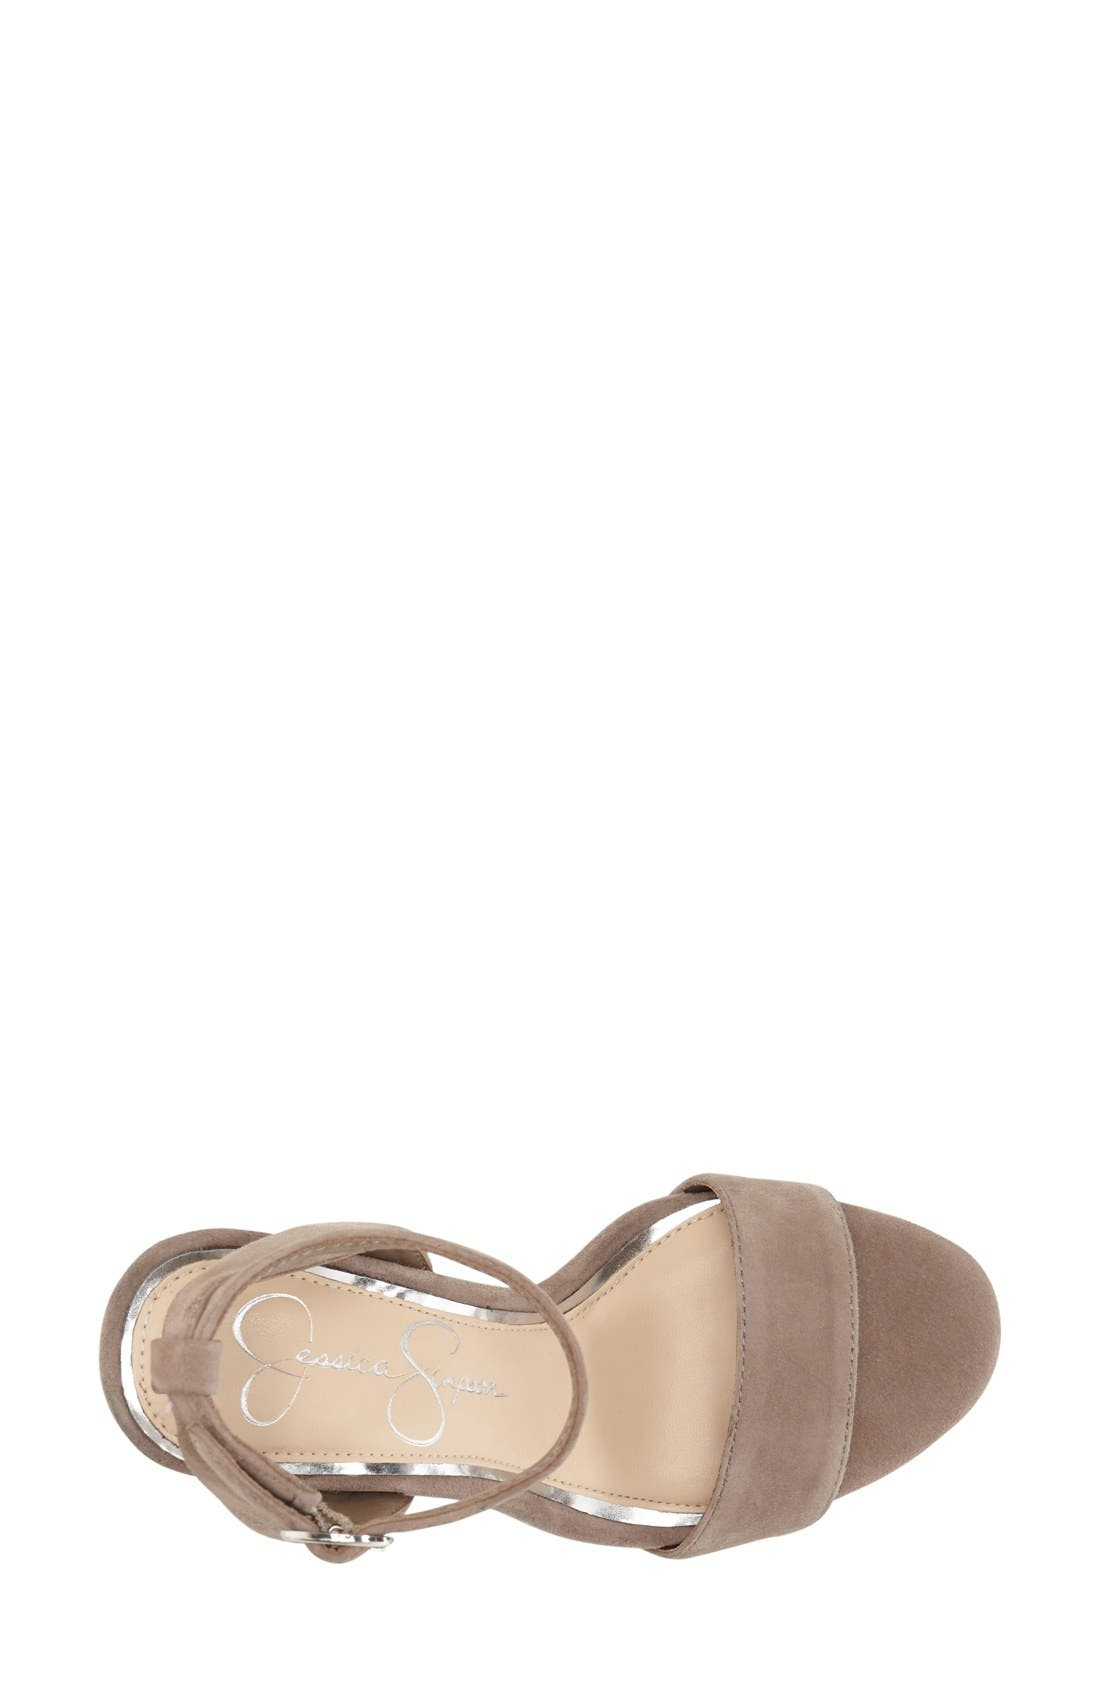 Alternate Image 3  - Jessica Simpson 'Banda' Embellished Platform Sandal (Women)